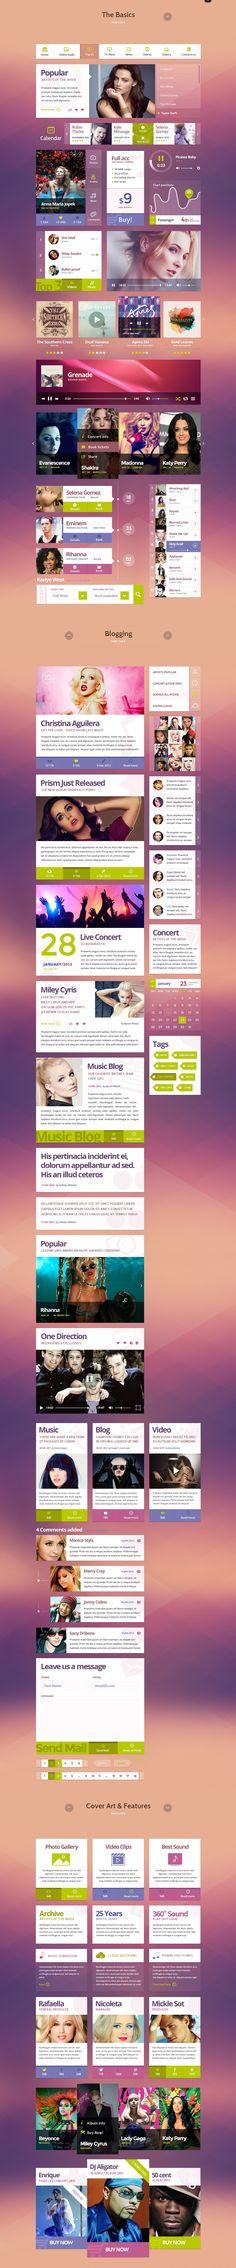 Funky Tunes UI Kit by WordPress Design Awards, via Behance Mobile Web Design, Web Ui Design, Graphic Design, Website Design Layout, Web Layout, Ui Kit, User Interface Design, Photoshop Design, Interactive Design